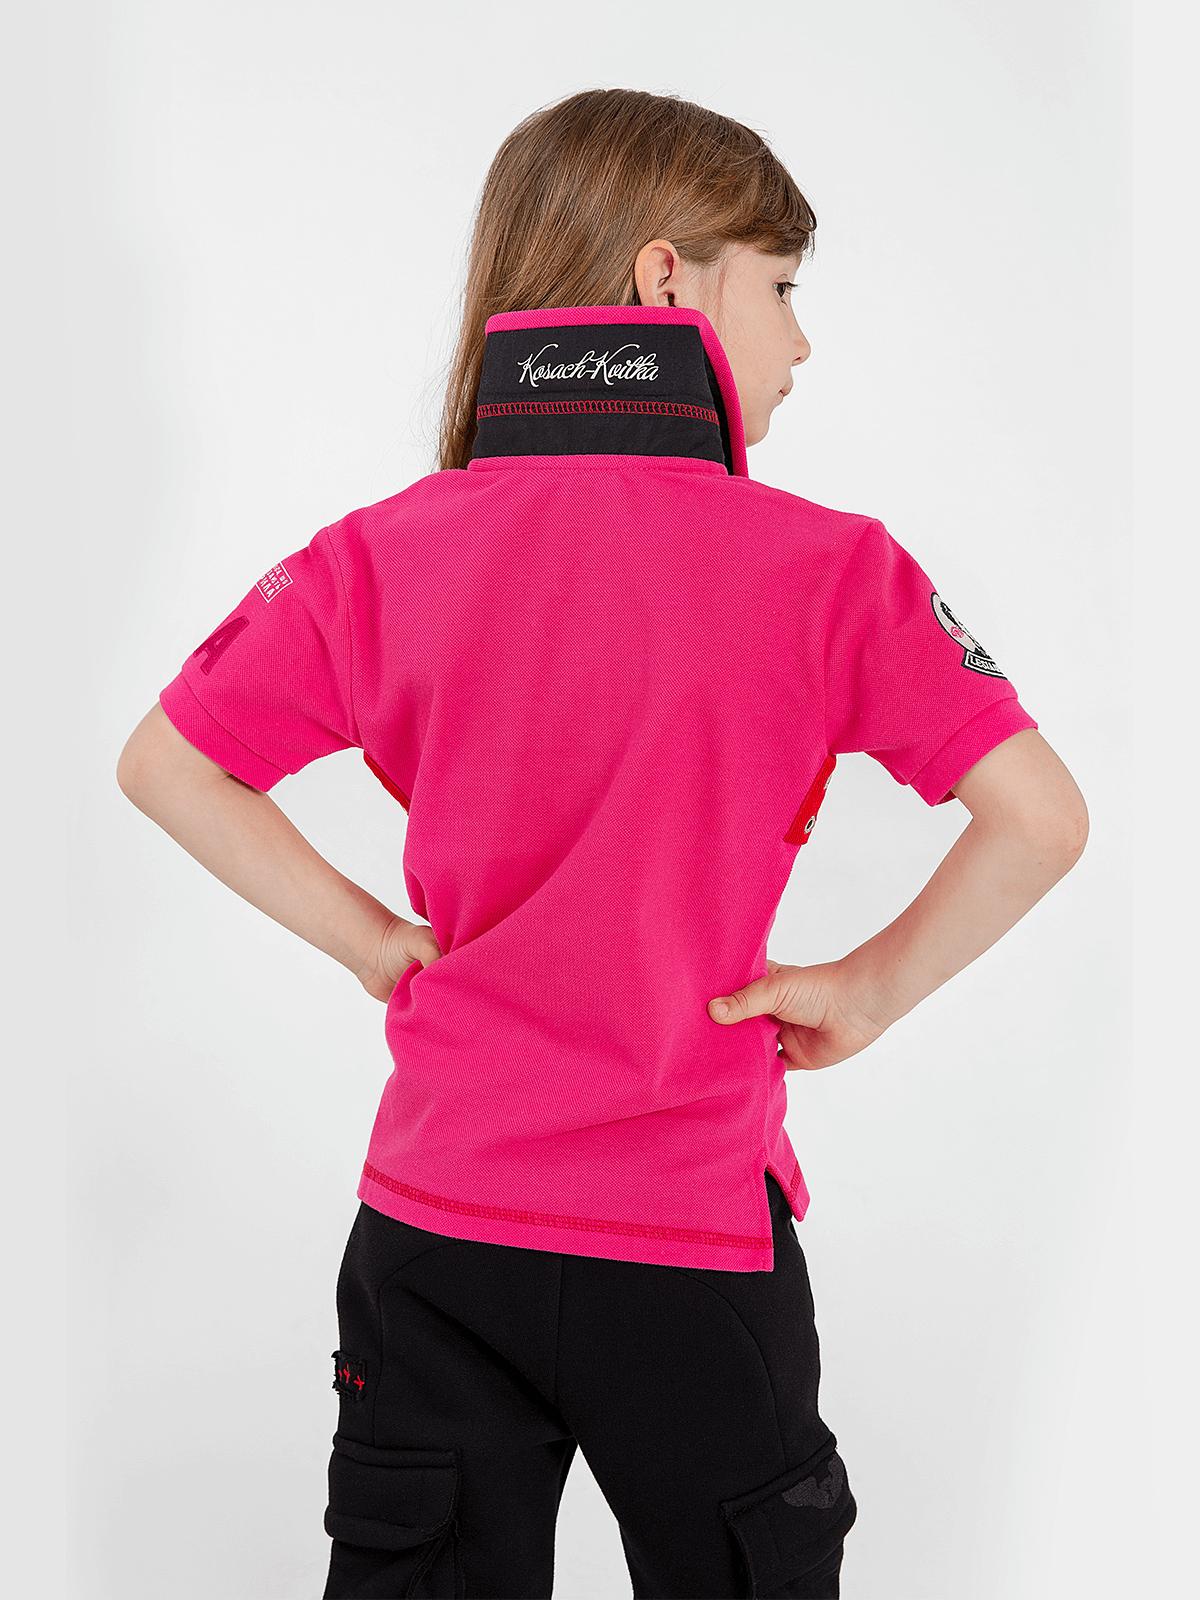 Kids Polo Shirt Lesia Ukrainka. Color pink.  Material: 100% cotton.